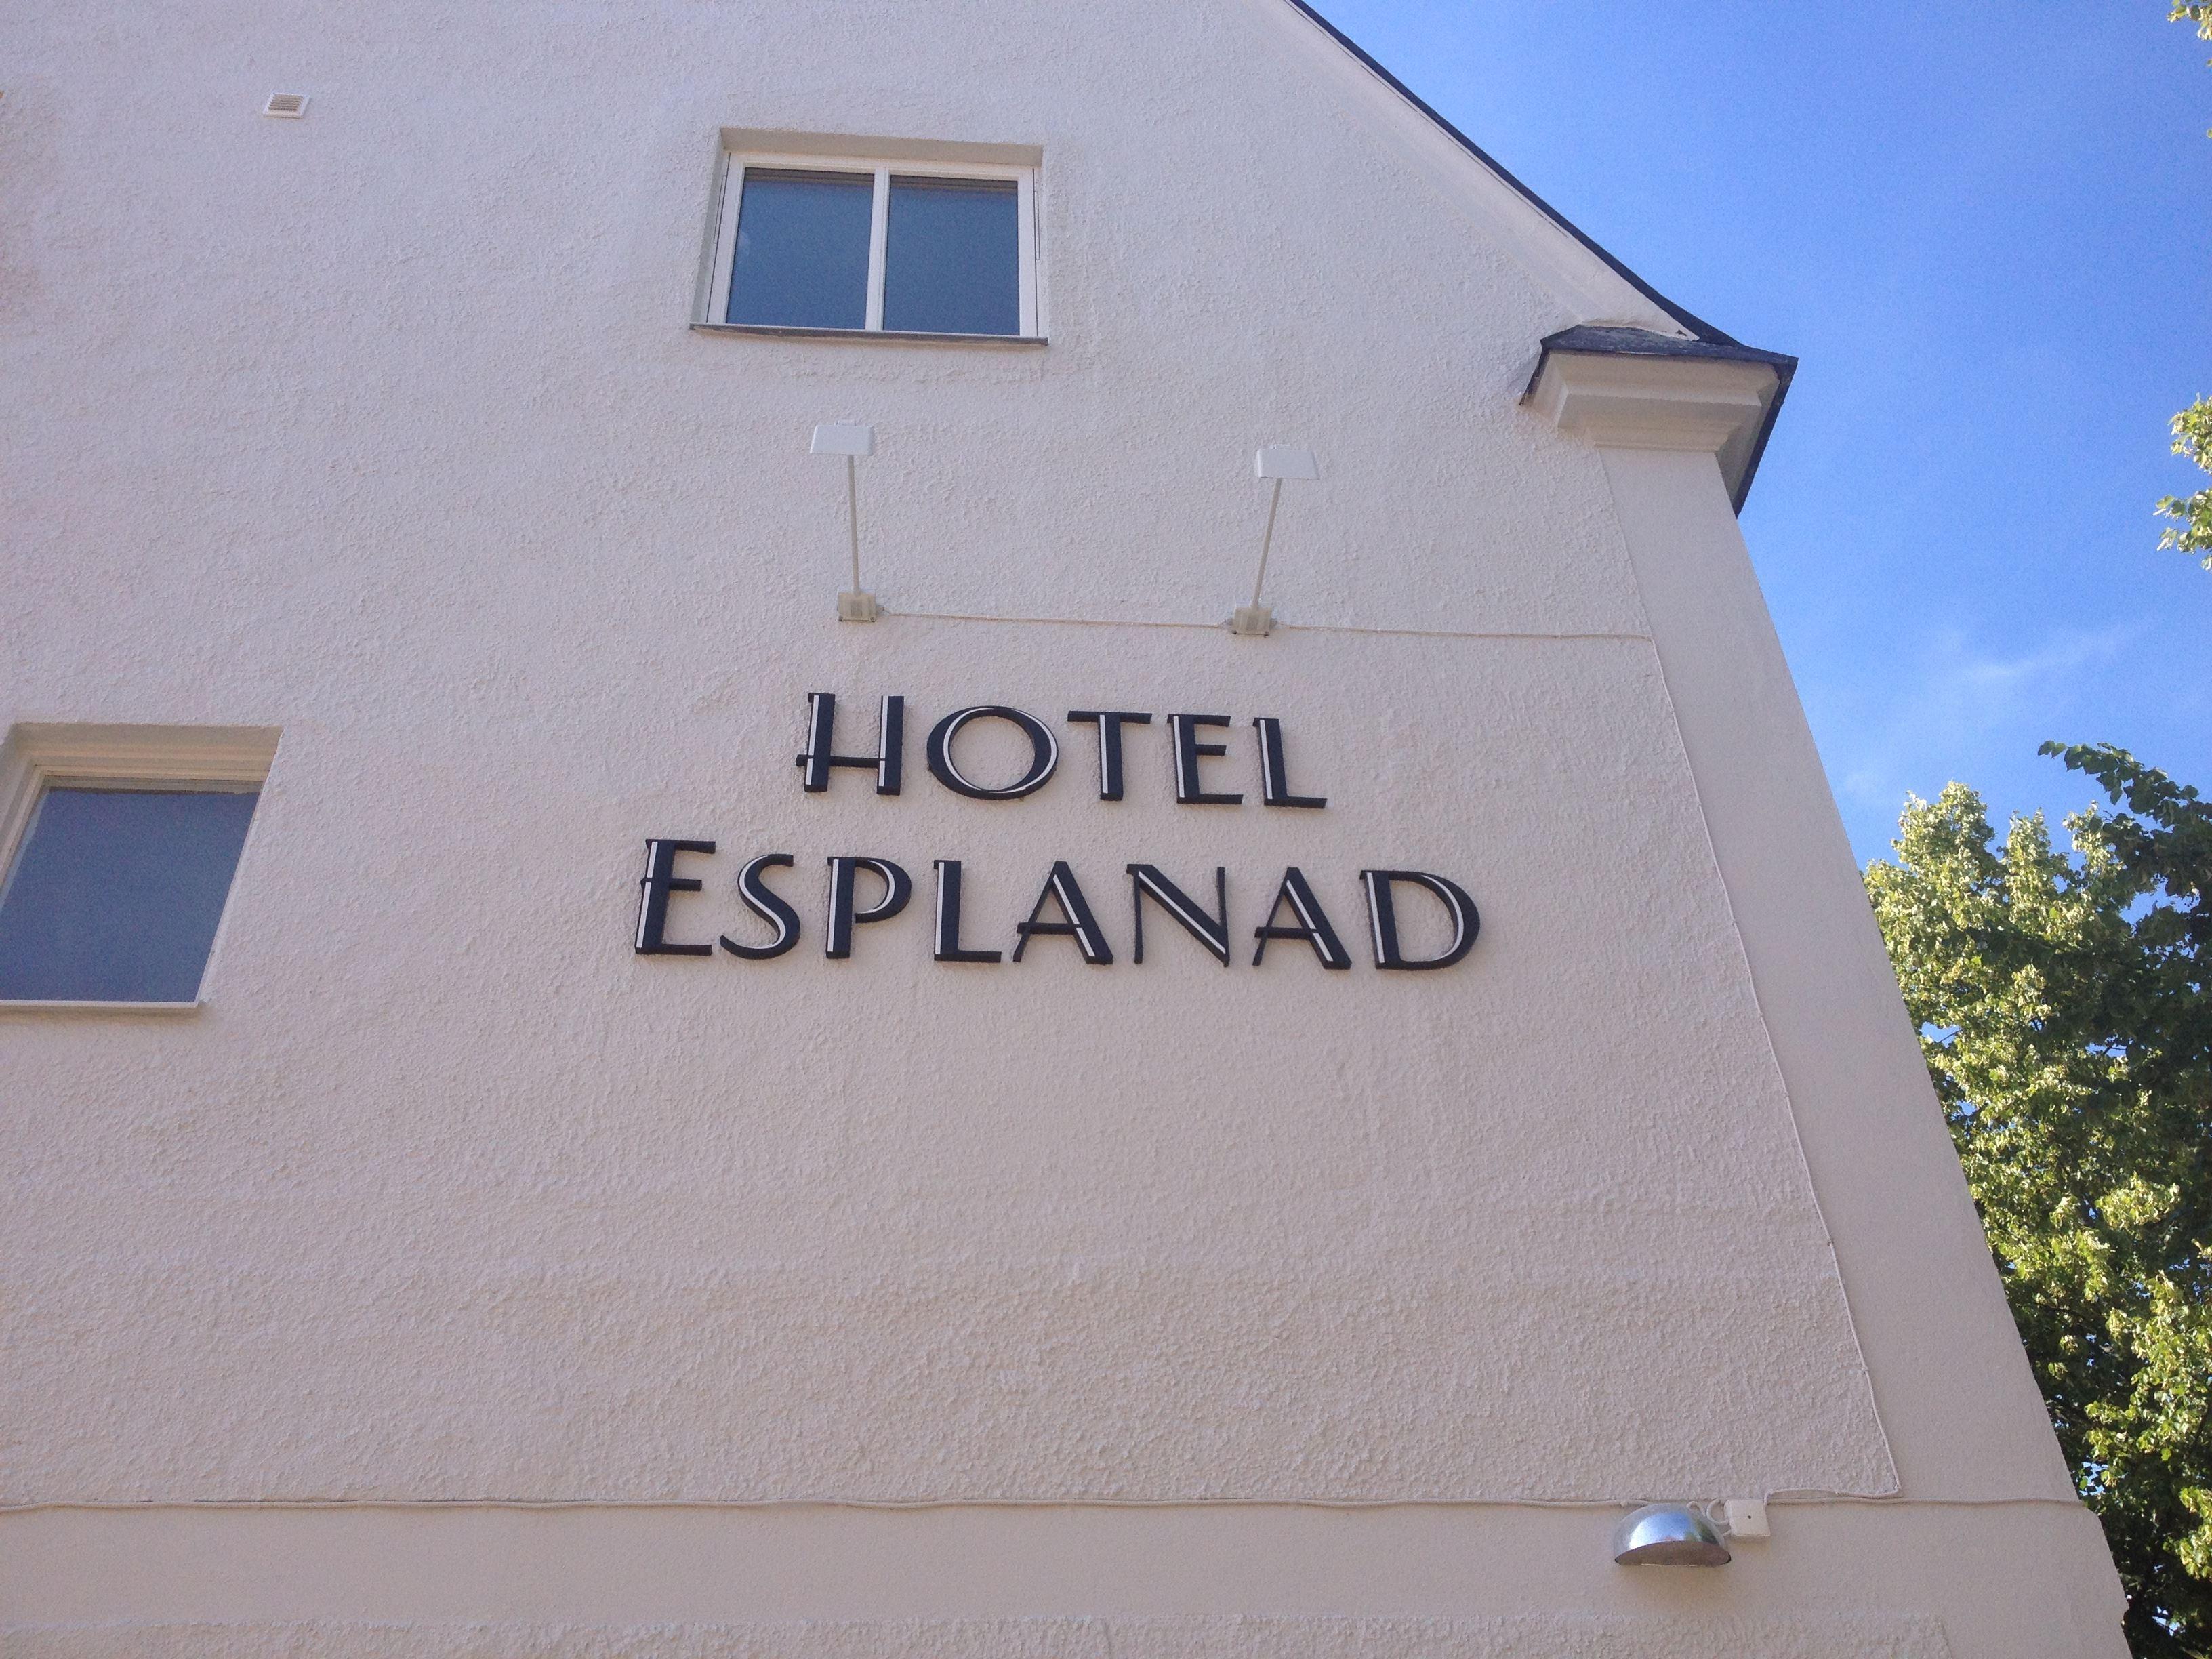 Hotell Esplanad